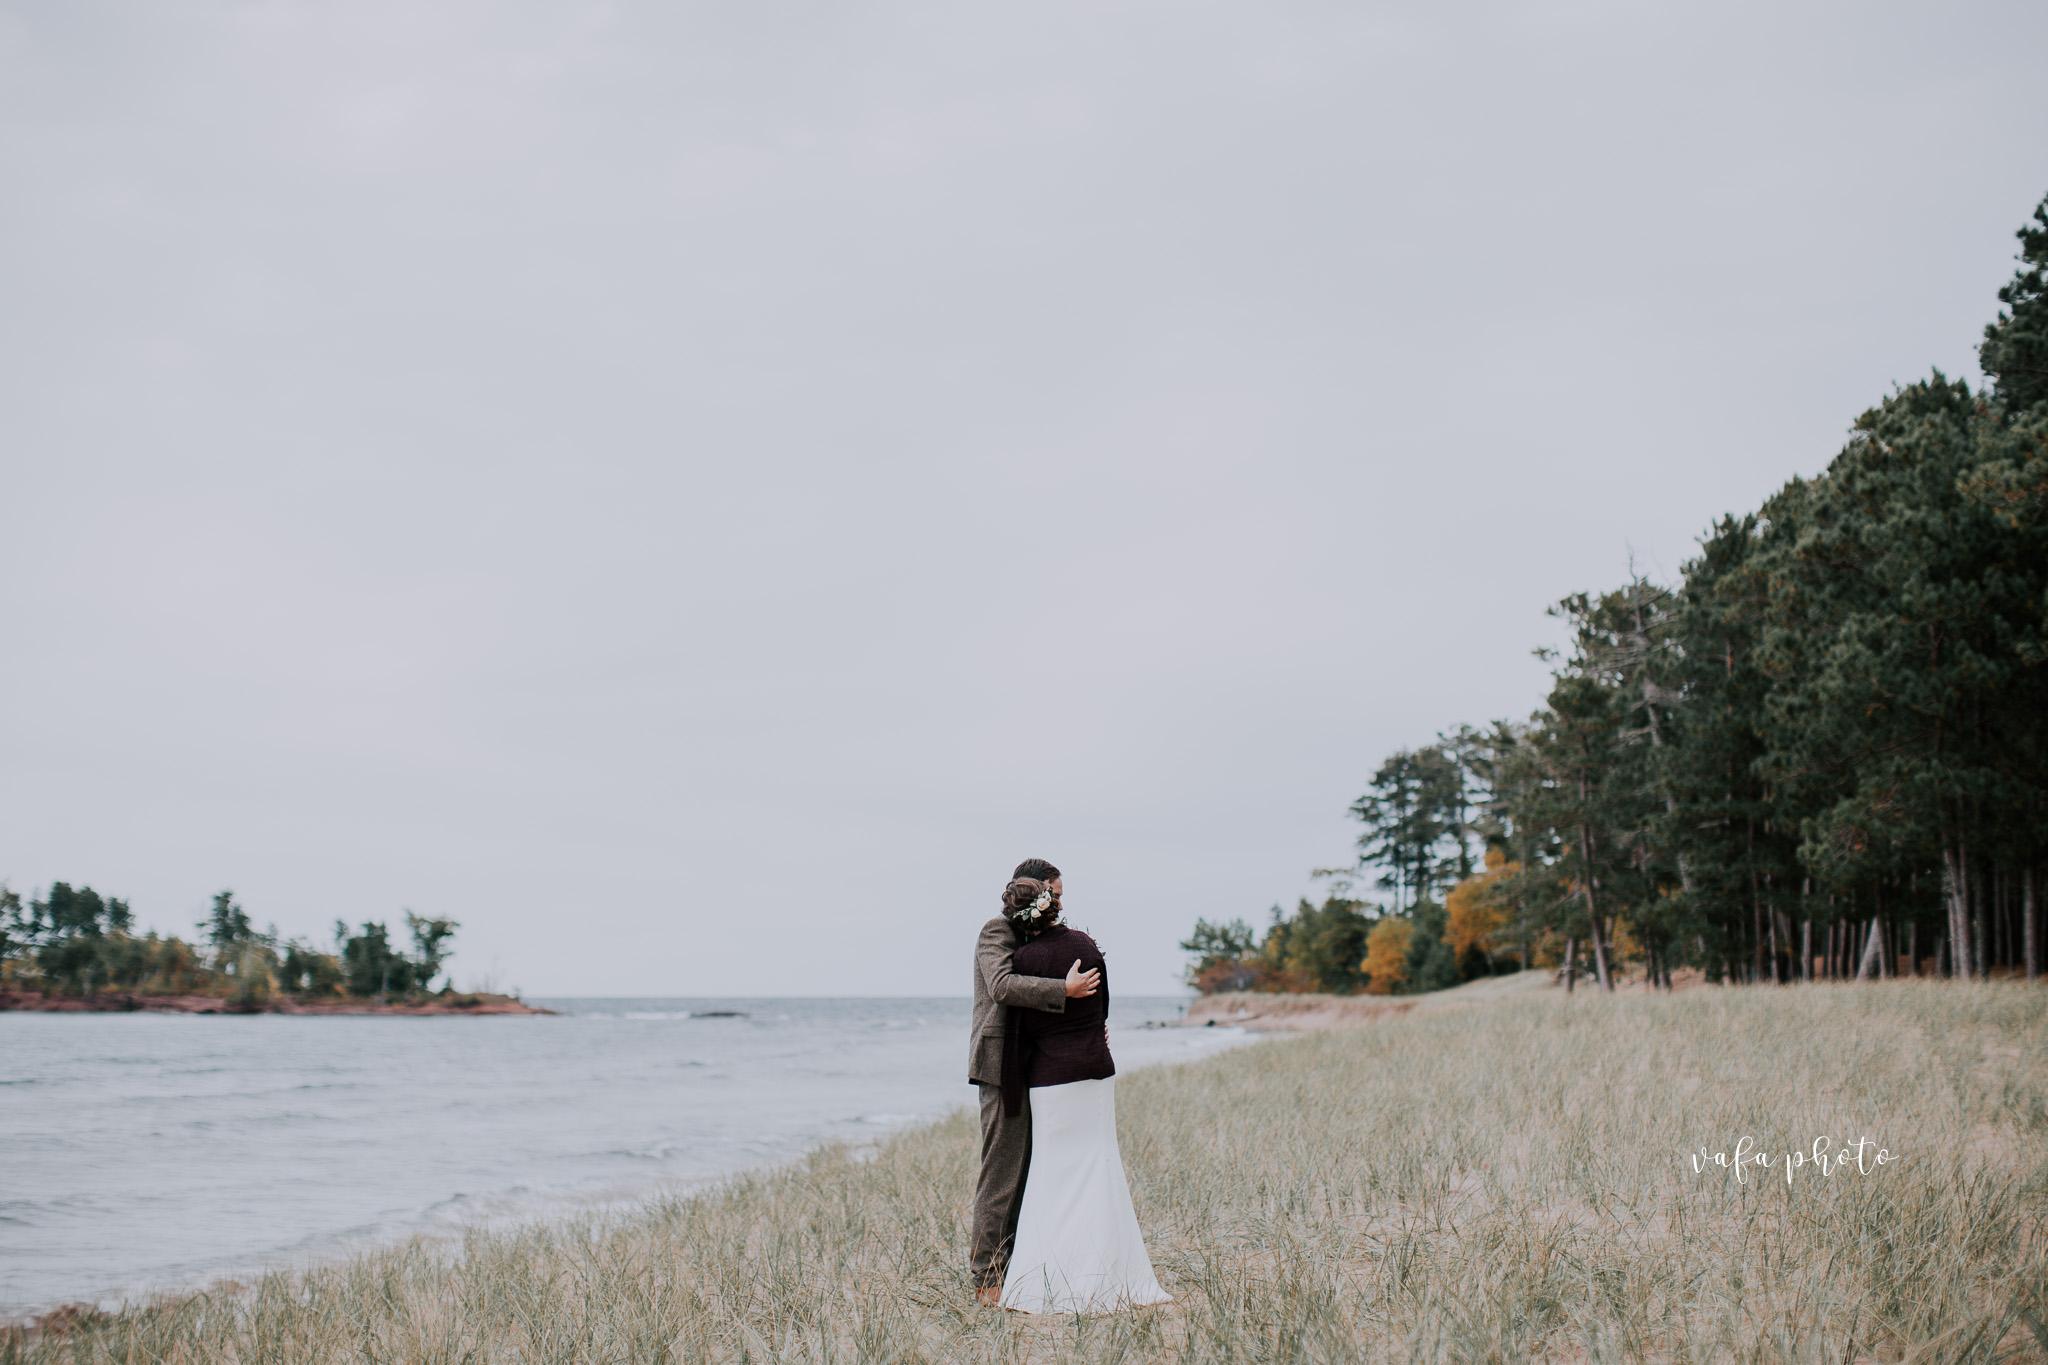 Little-Presque-Isle-Michigan-Wedding-Kim-Kyle-Vafa-Photo-447.jpg